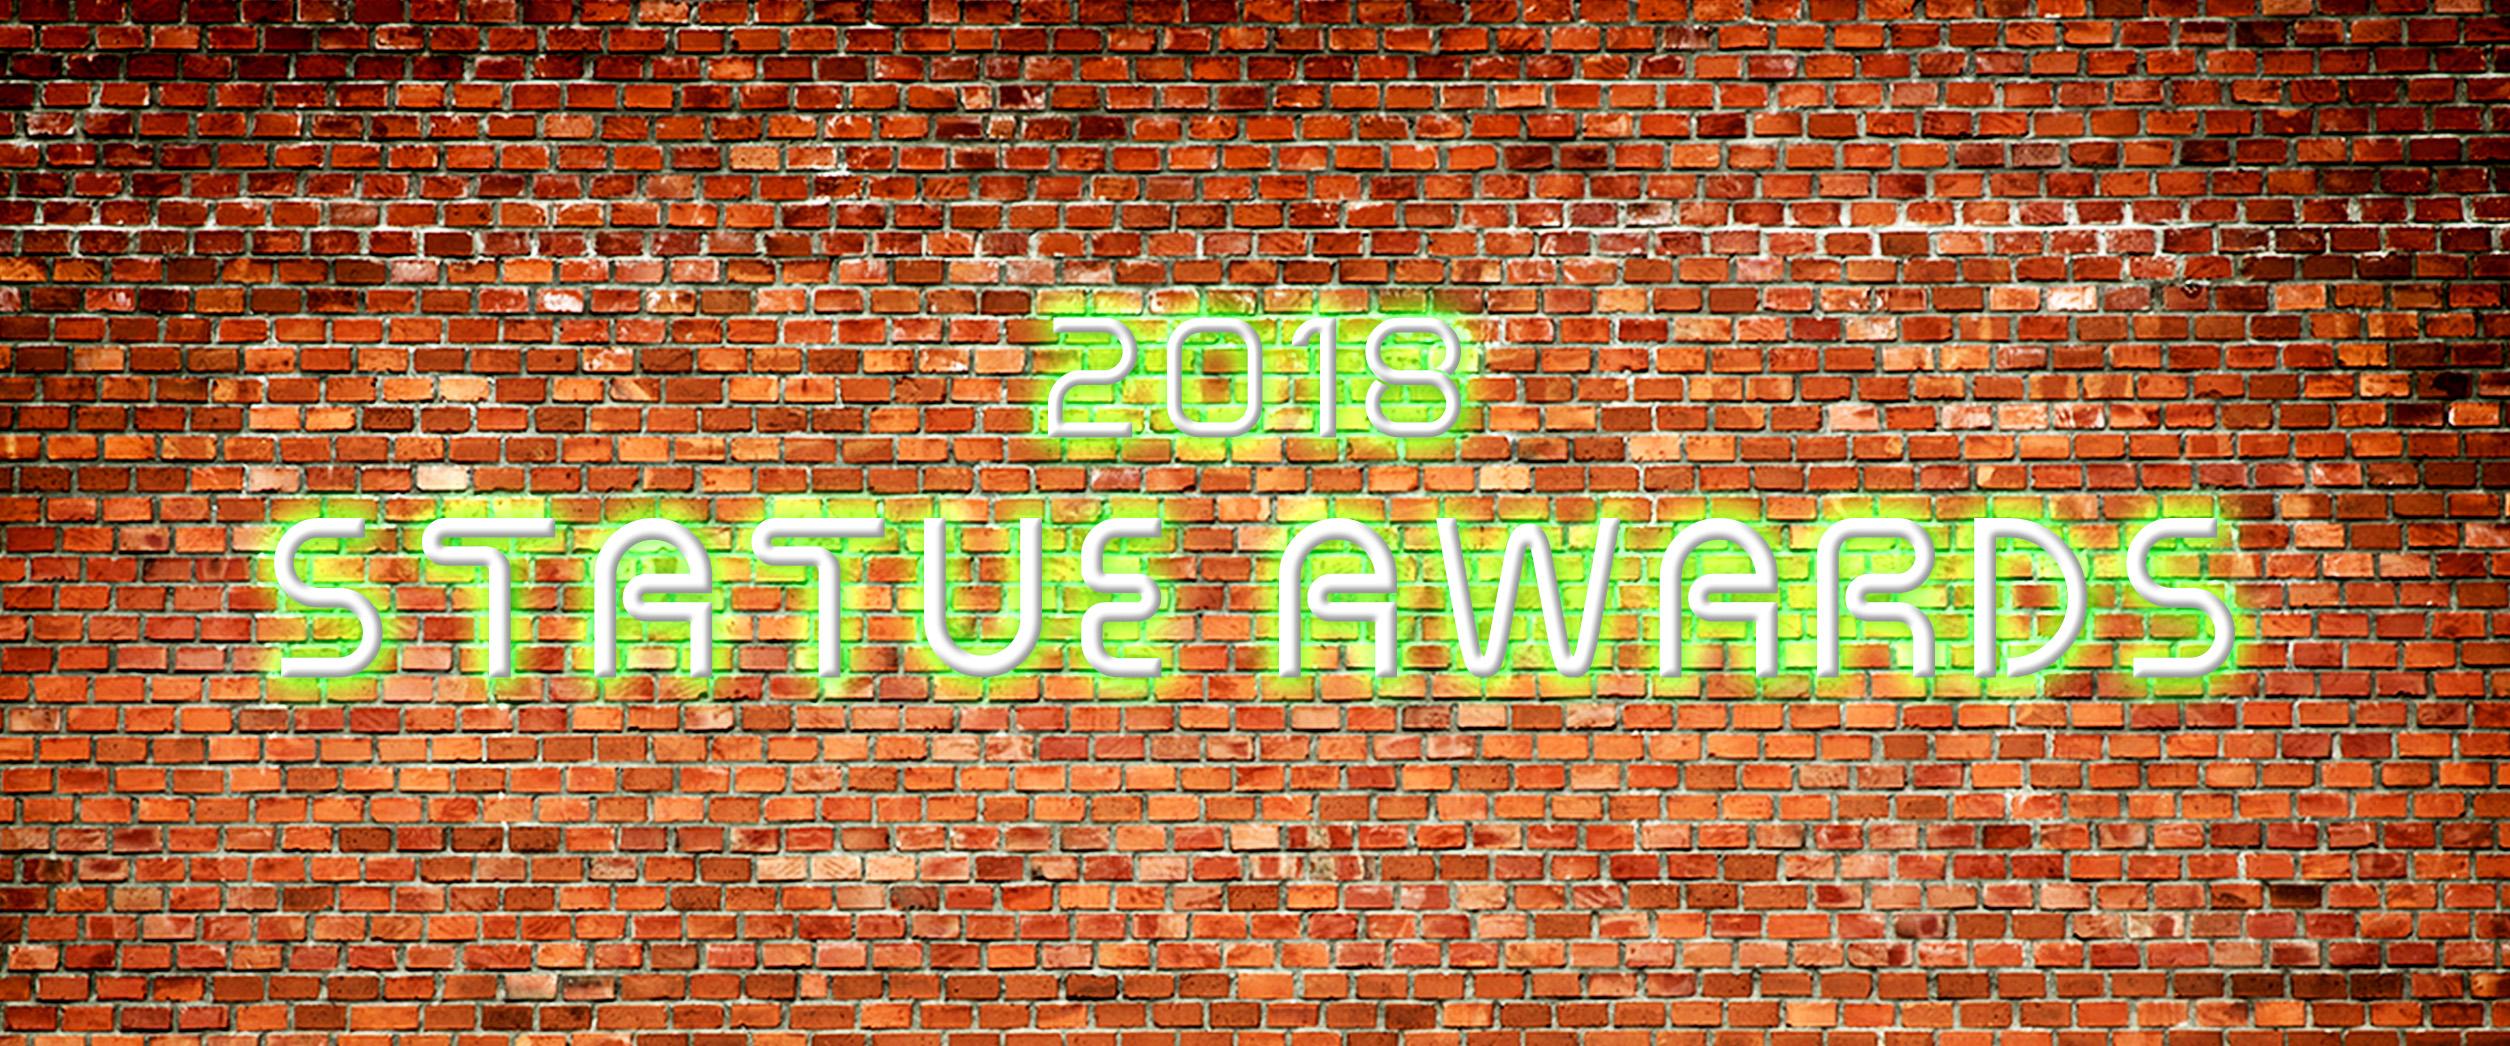 https://www.bmutha.com/wp-content/uploads/2018/12/Award-Banner.jpg